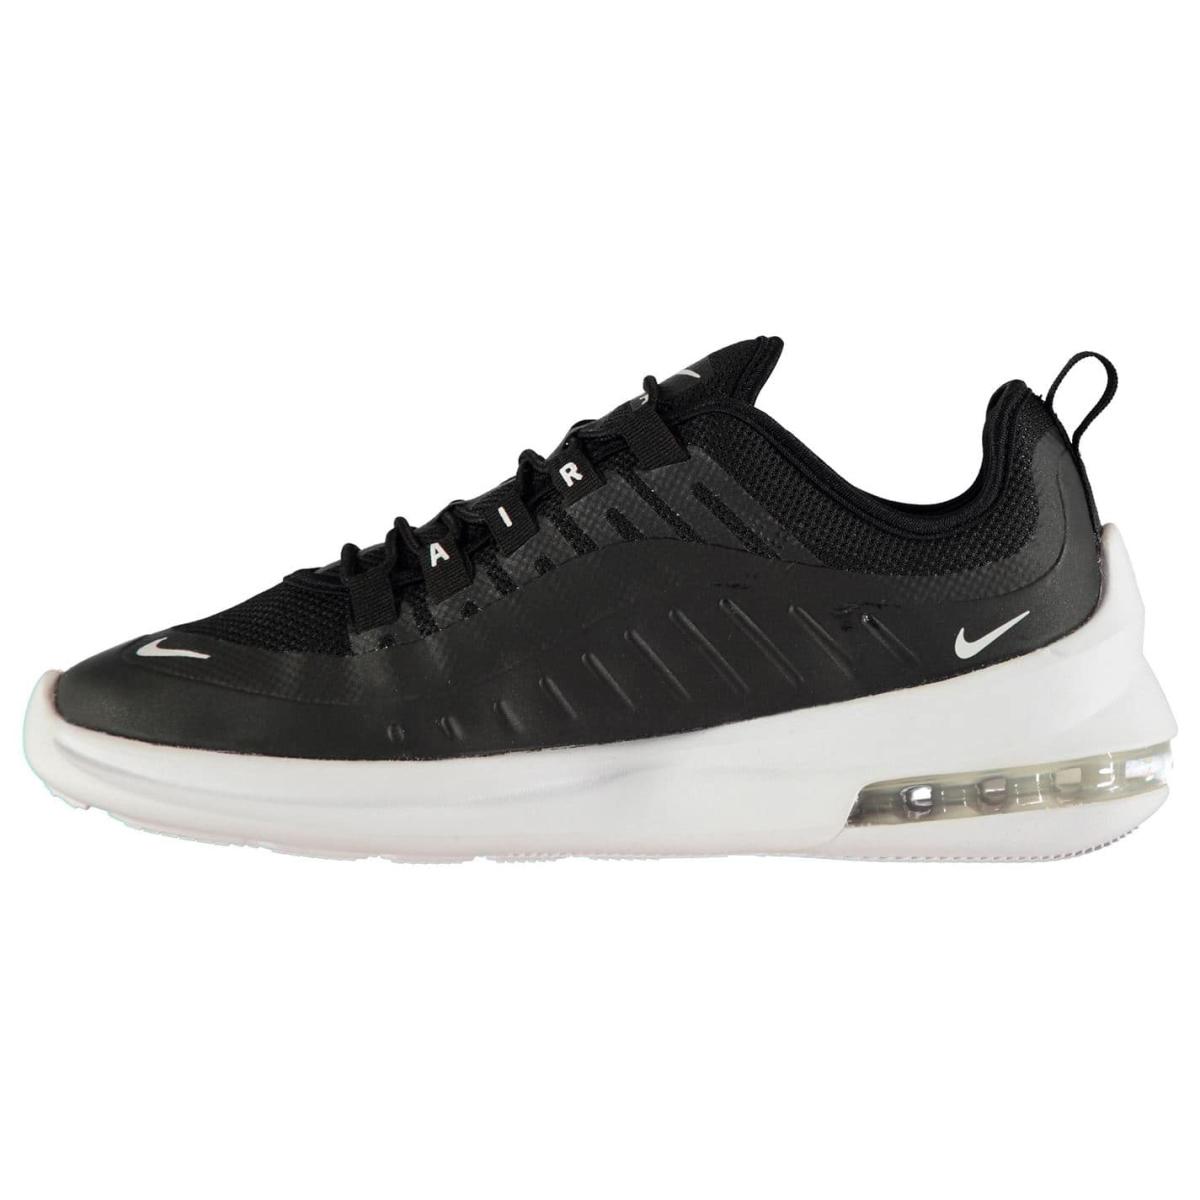 NIKE-Air-Max-Axis-Scarpe-da-ginnastica-Scarpe-da-Corsa-Uomo-Sneaker-Scarpe-Sportive-Fitness-1313 miniatura 29